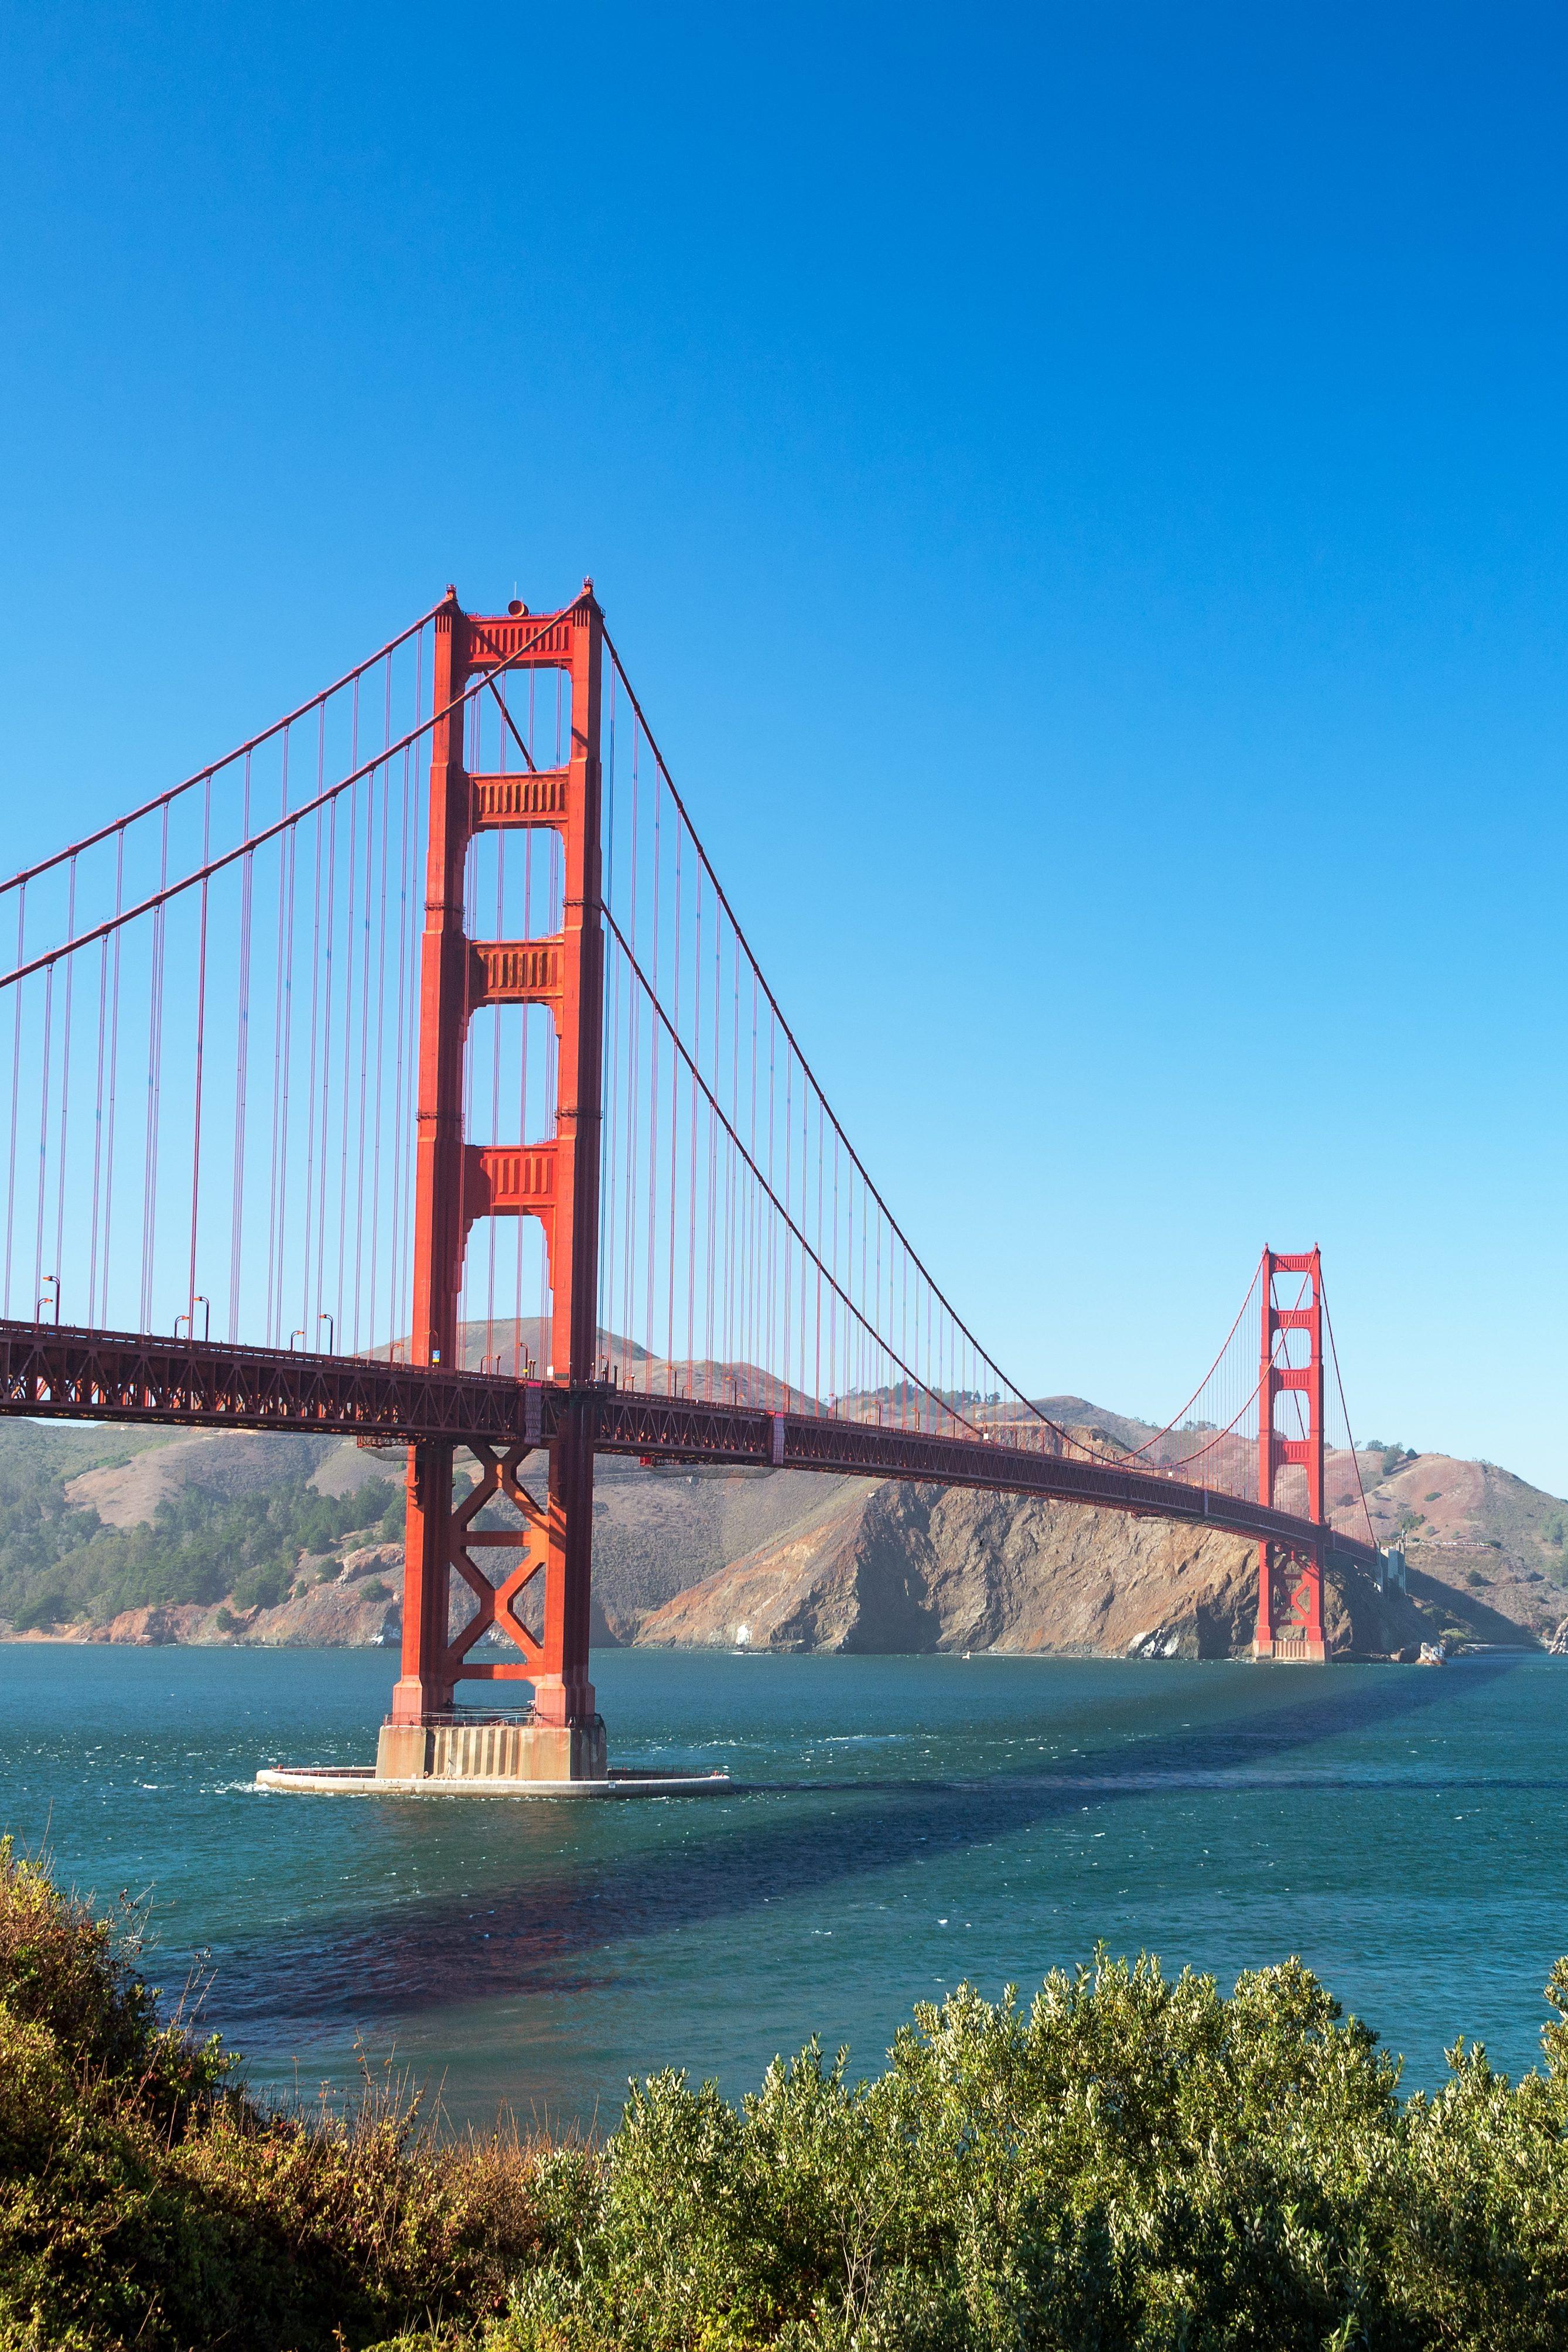 California, USA